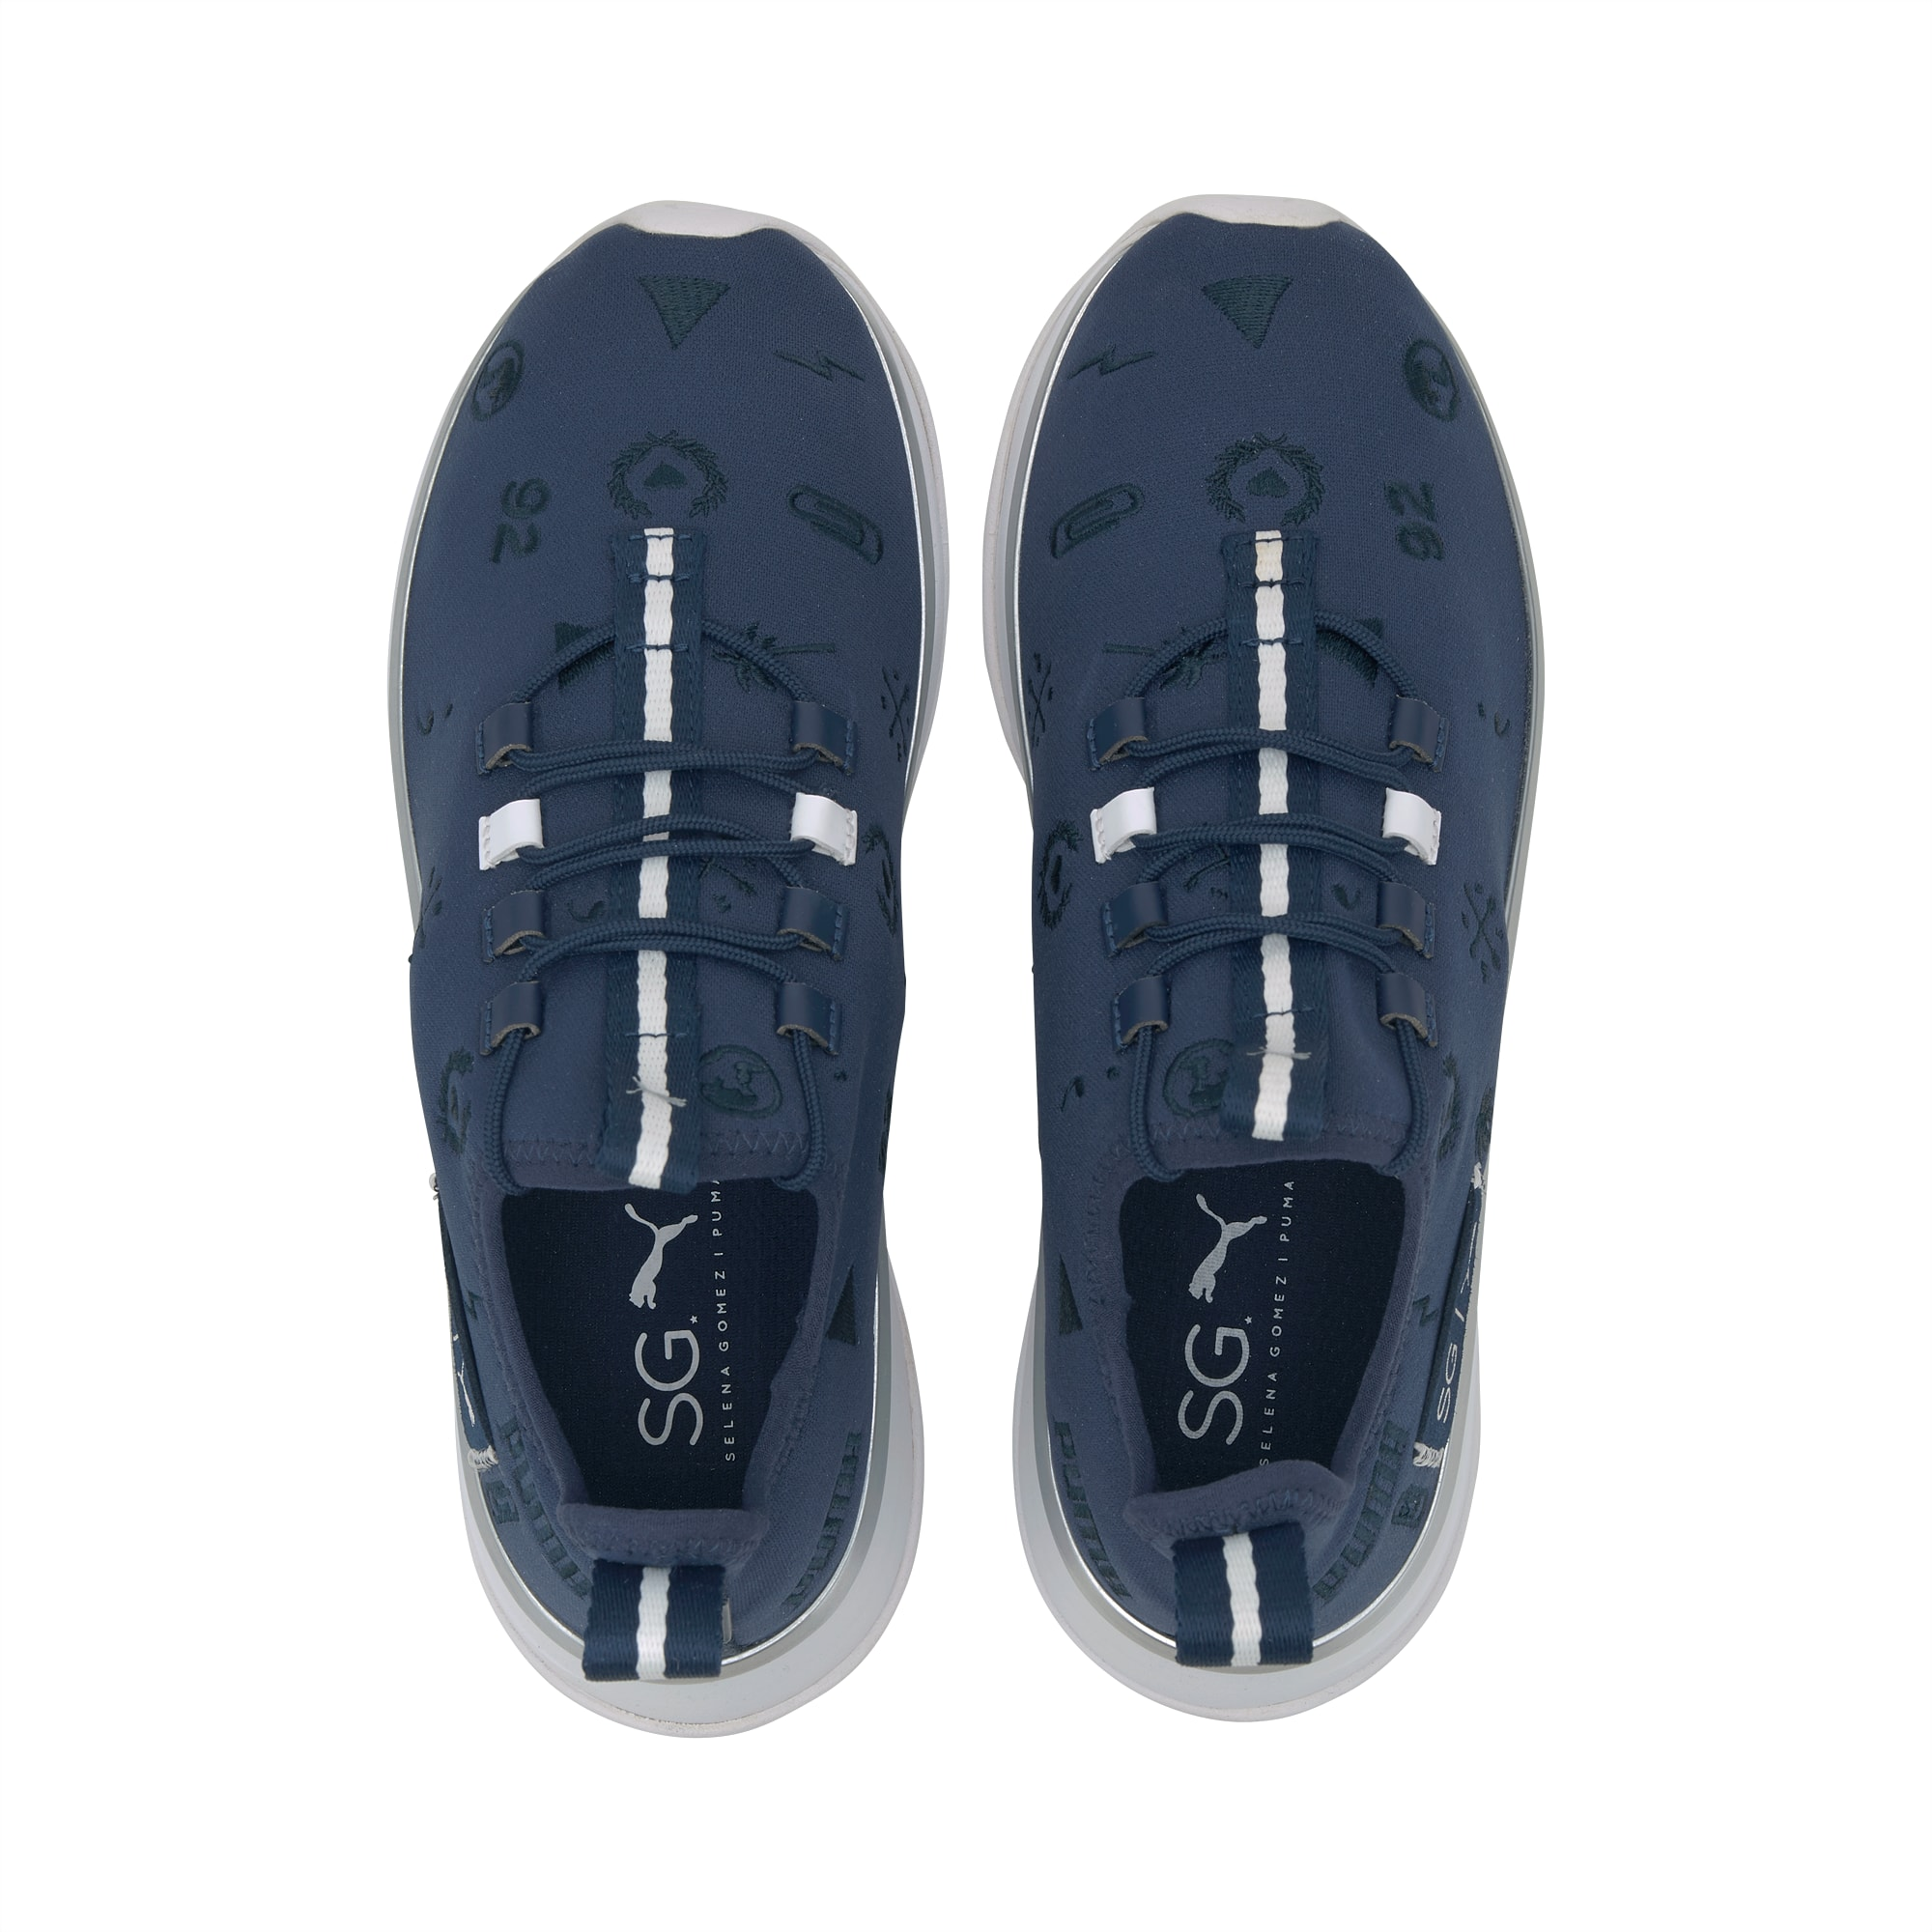 PUMA x SELENA GOMEZ Runner Embroidery Women's Training Shoes